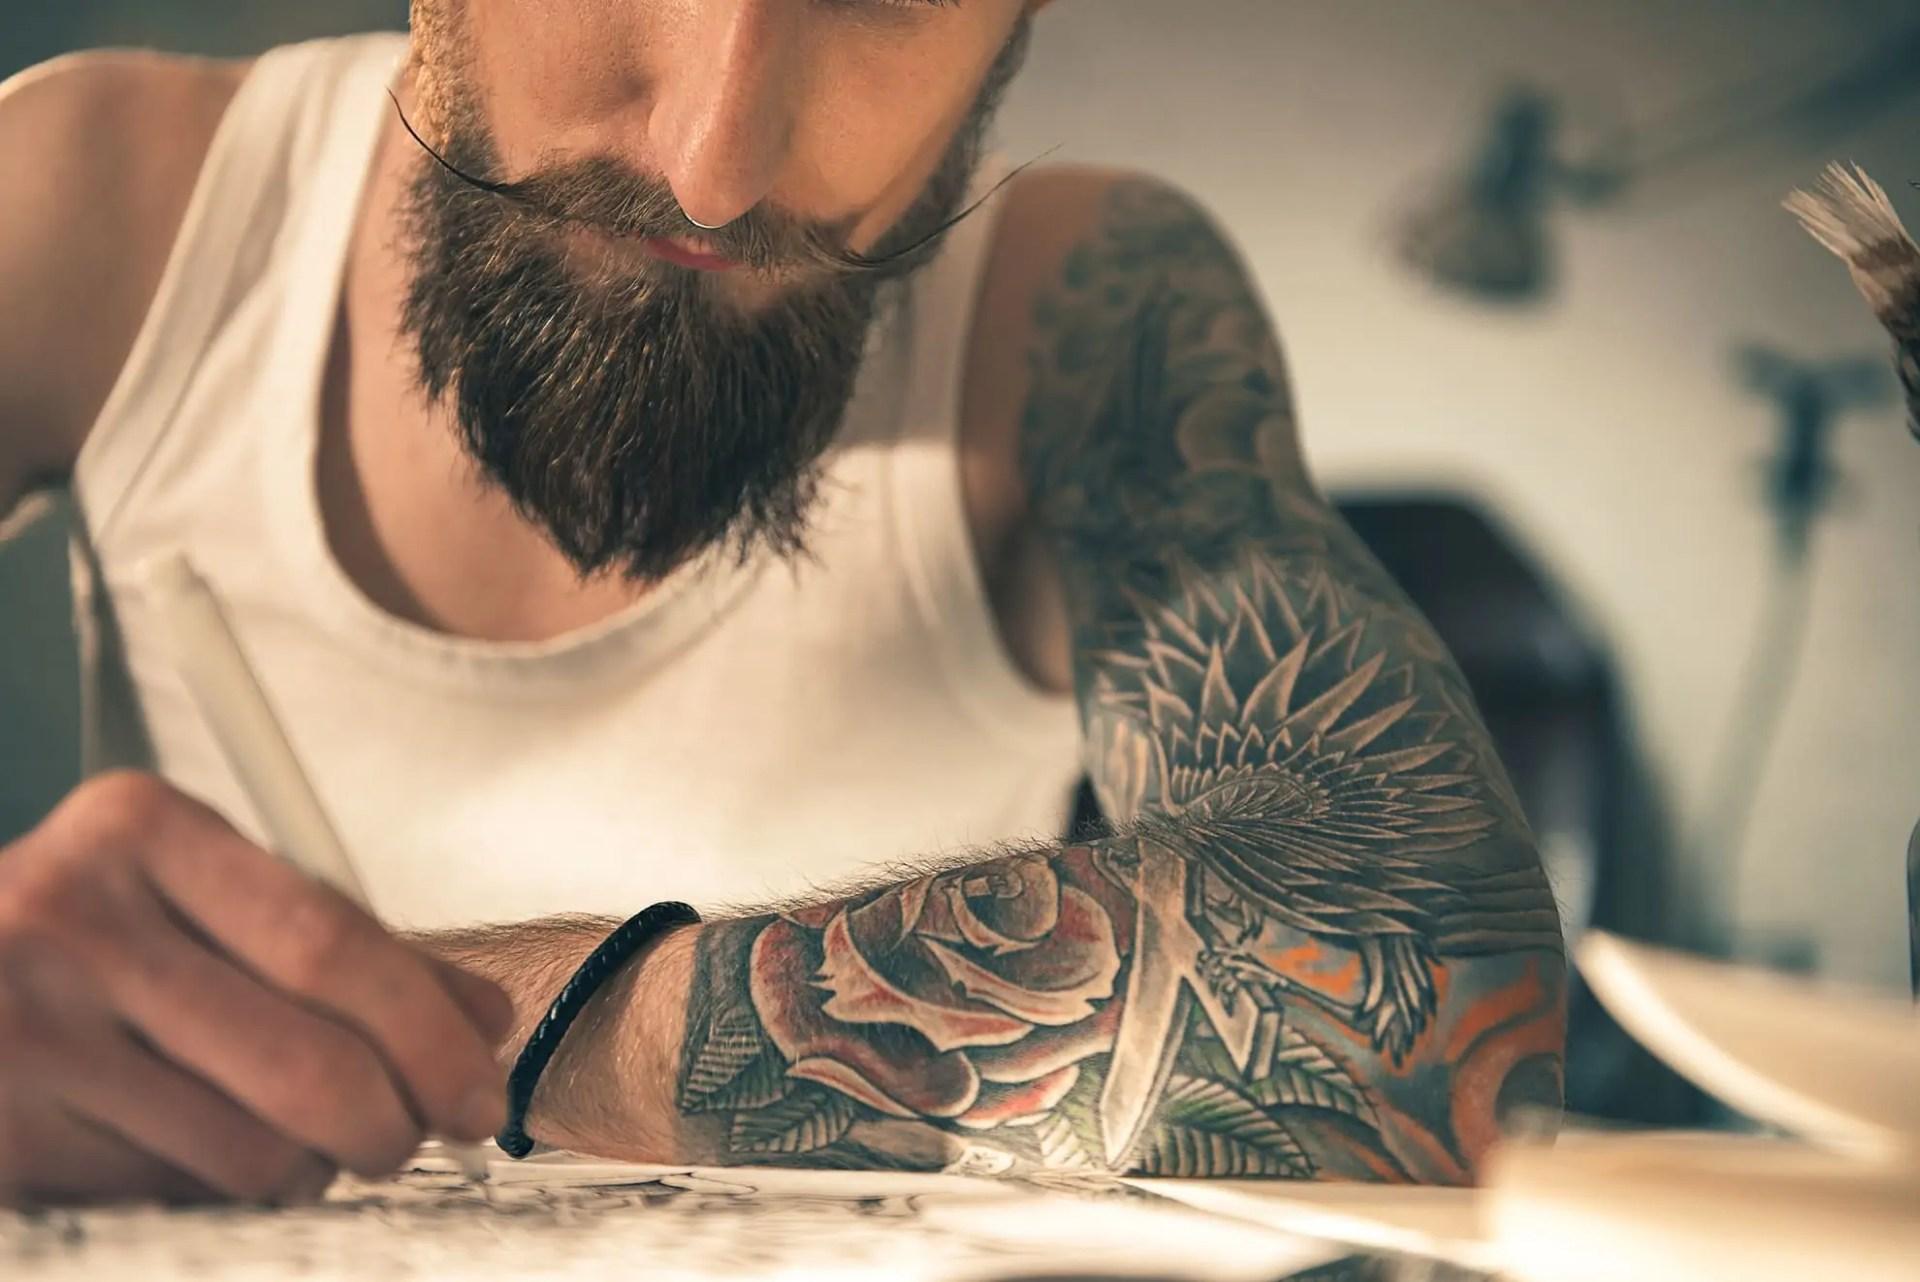 onweerstaanbare-tattoo's-3